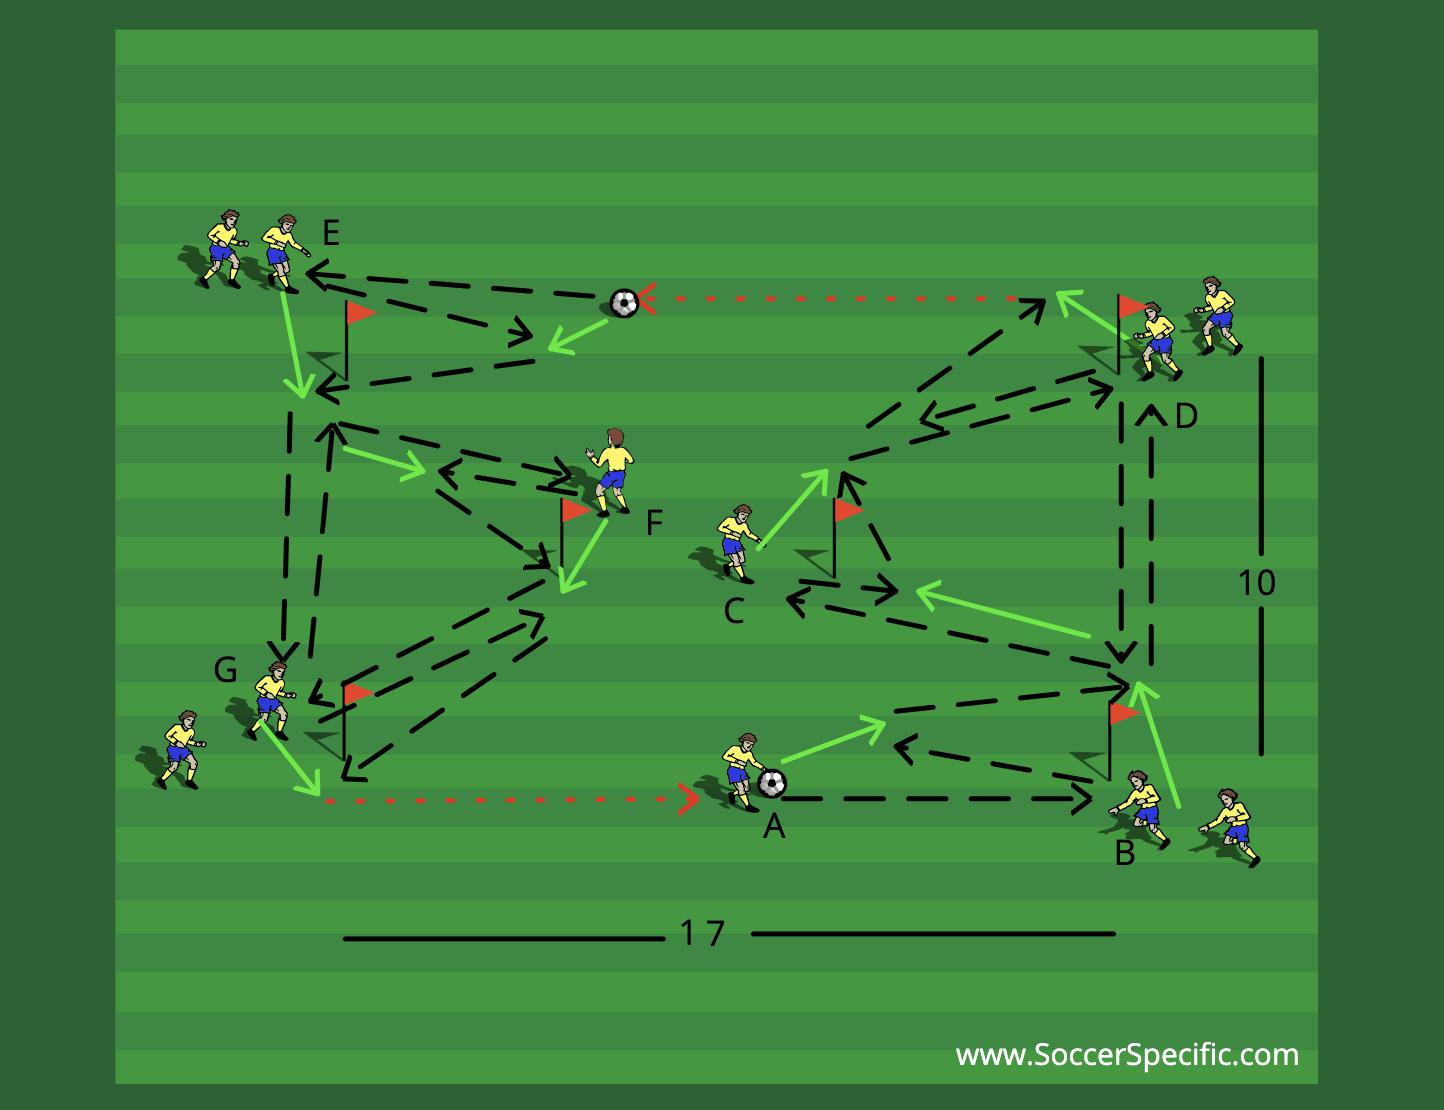 LA Rectangle Passing 2 | SoccerSpecific.com